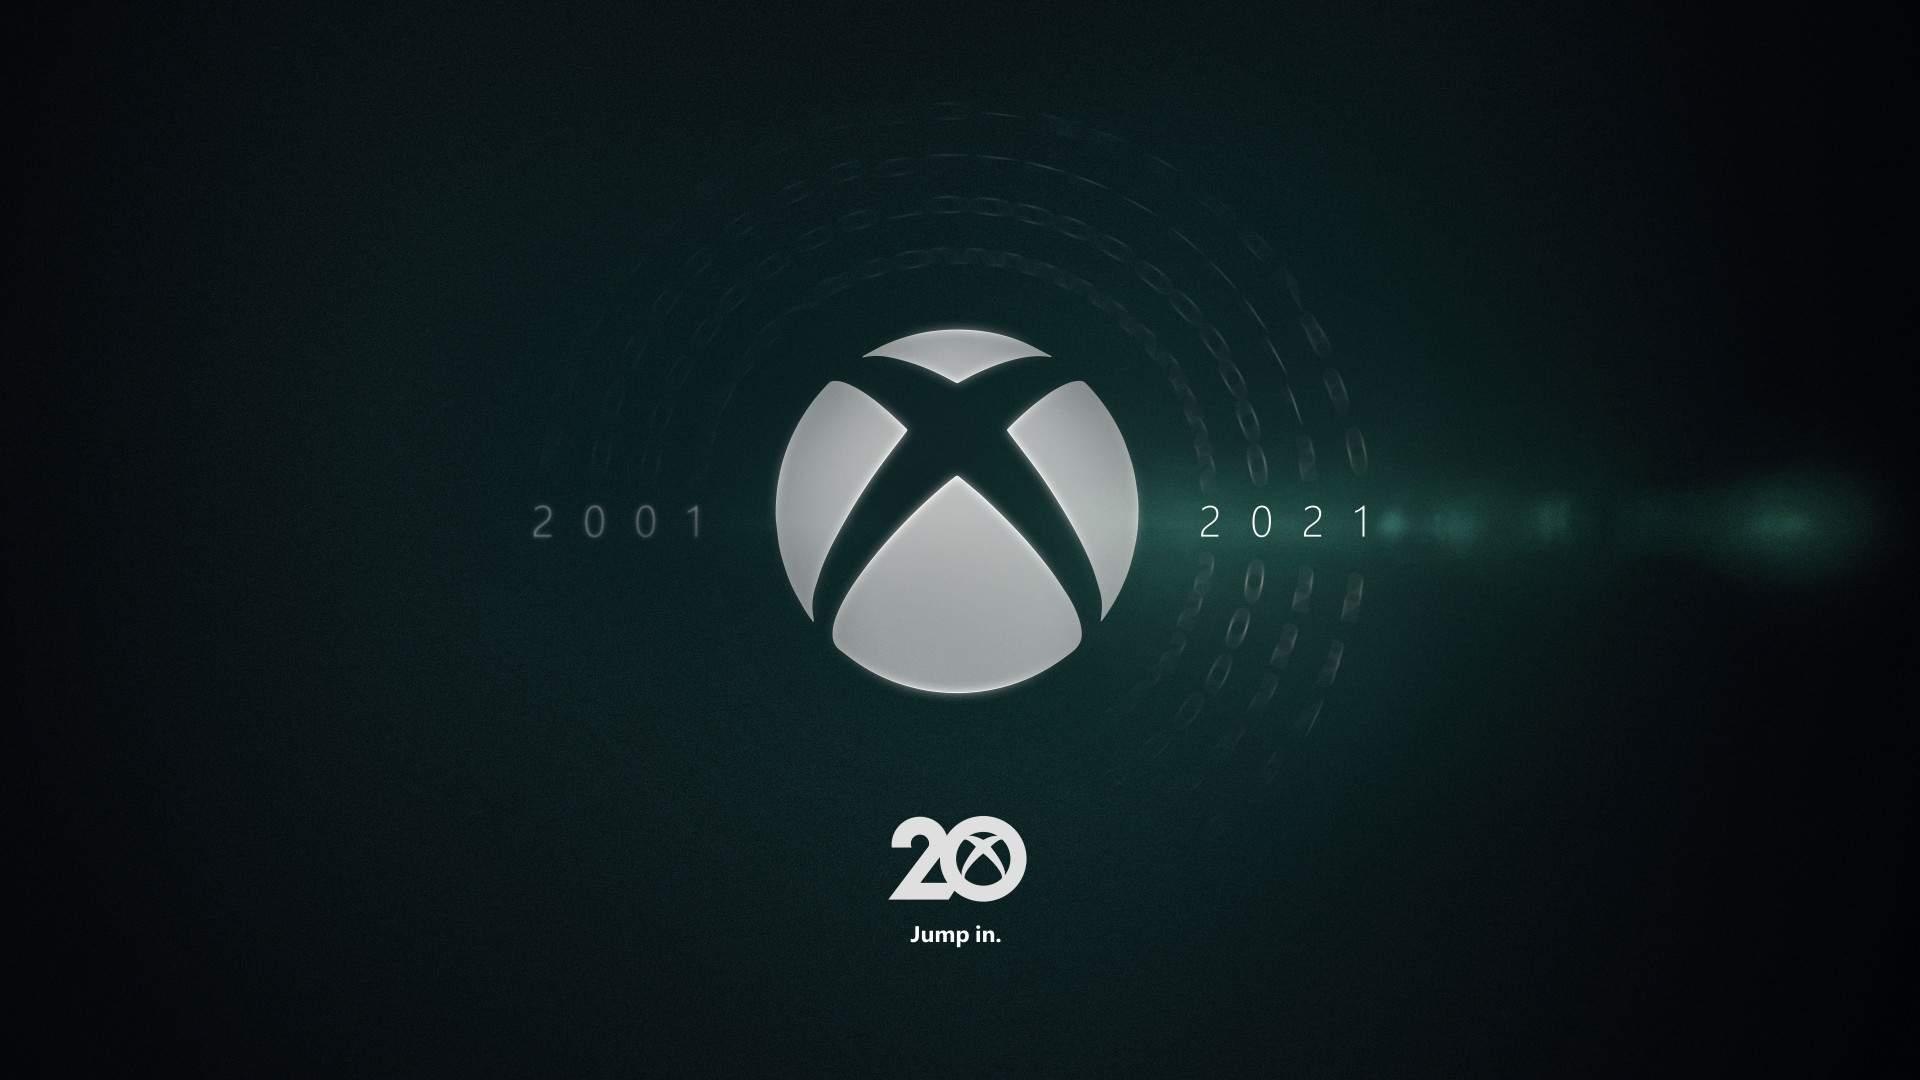 Похоже, Microsoft готовит «юбилейный» геймпад Xbox